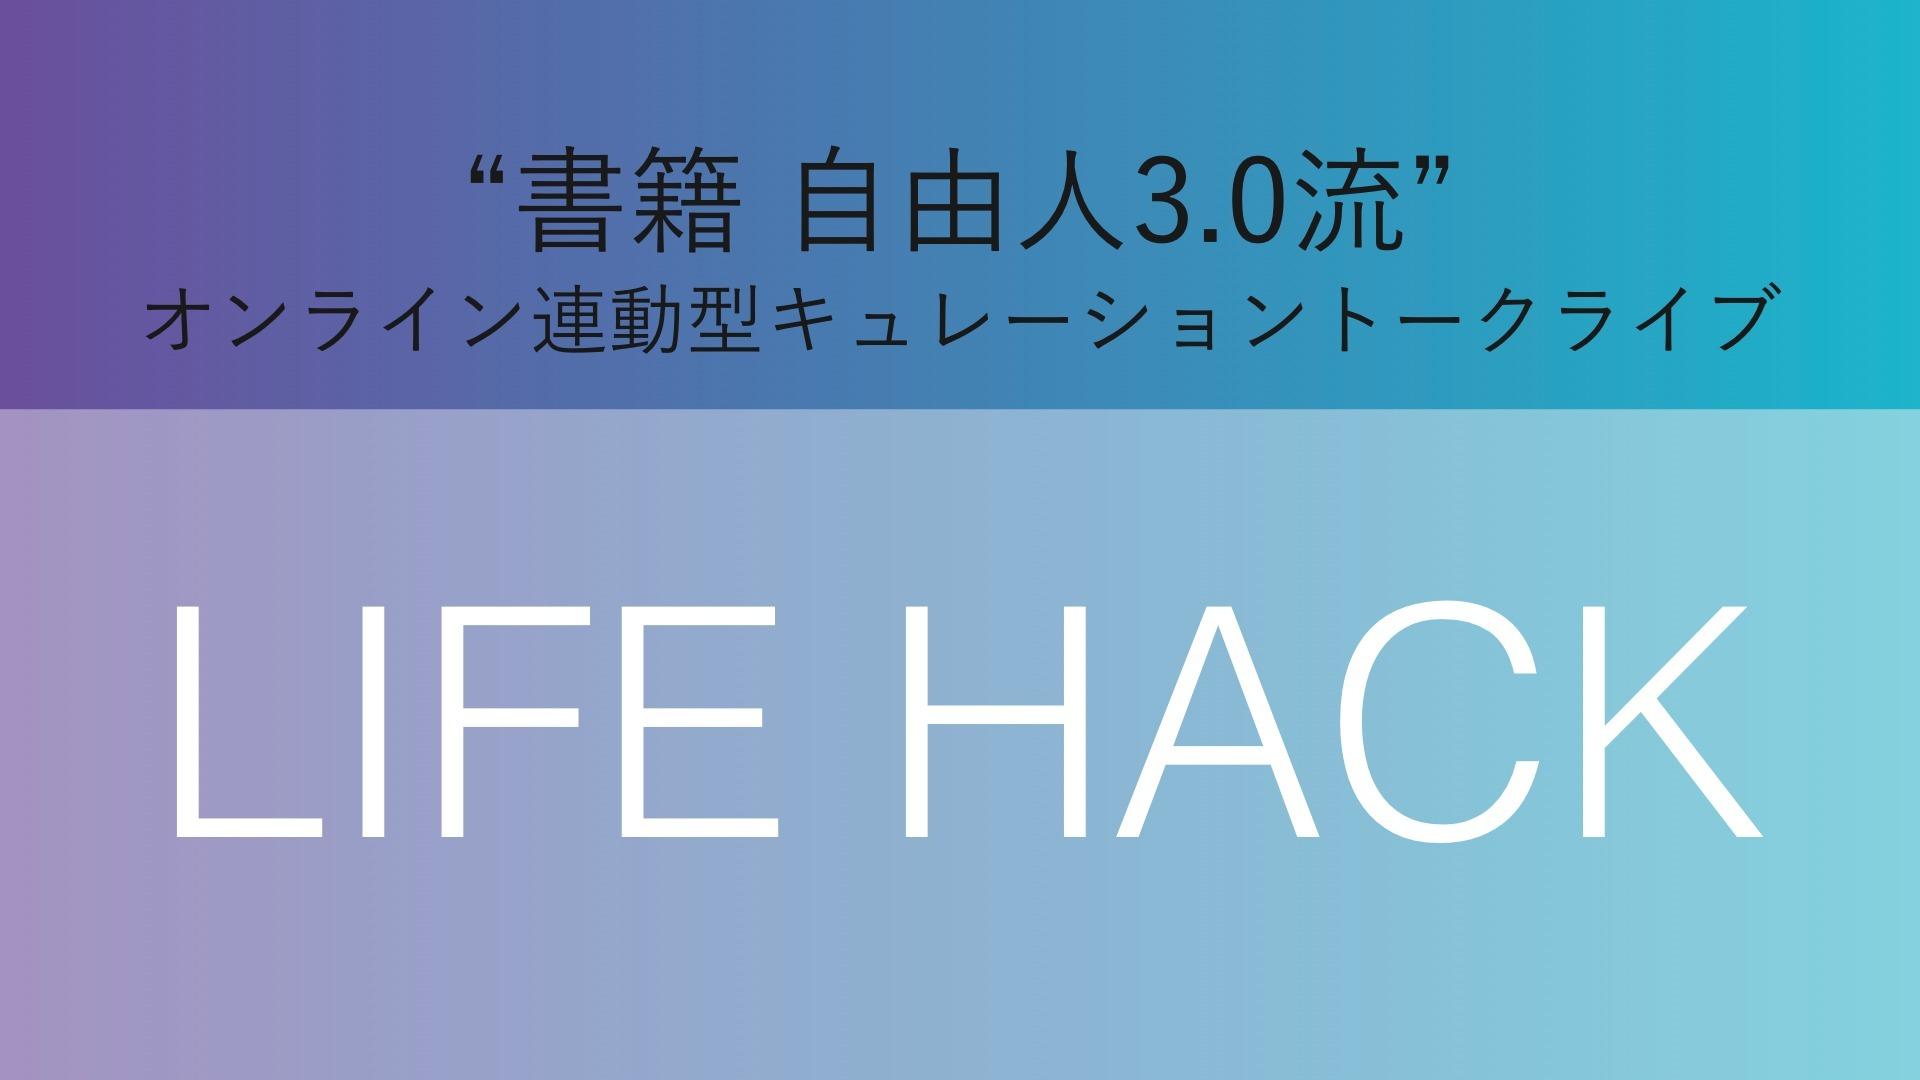 LIFE HACK(2019.04)